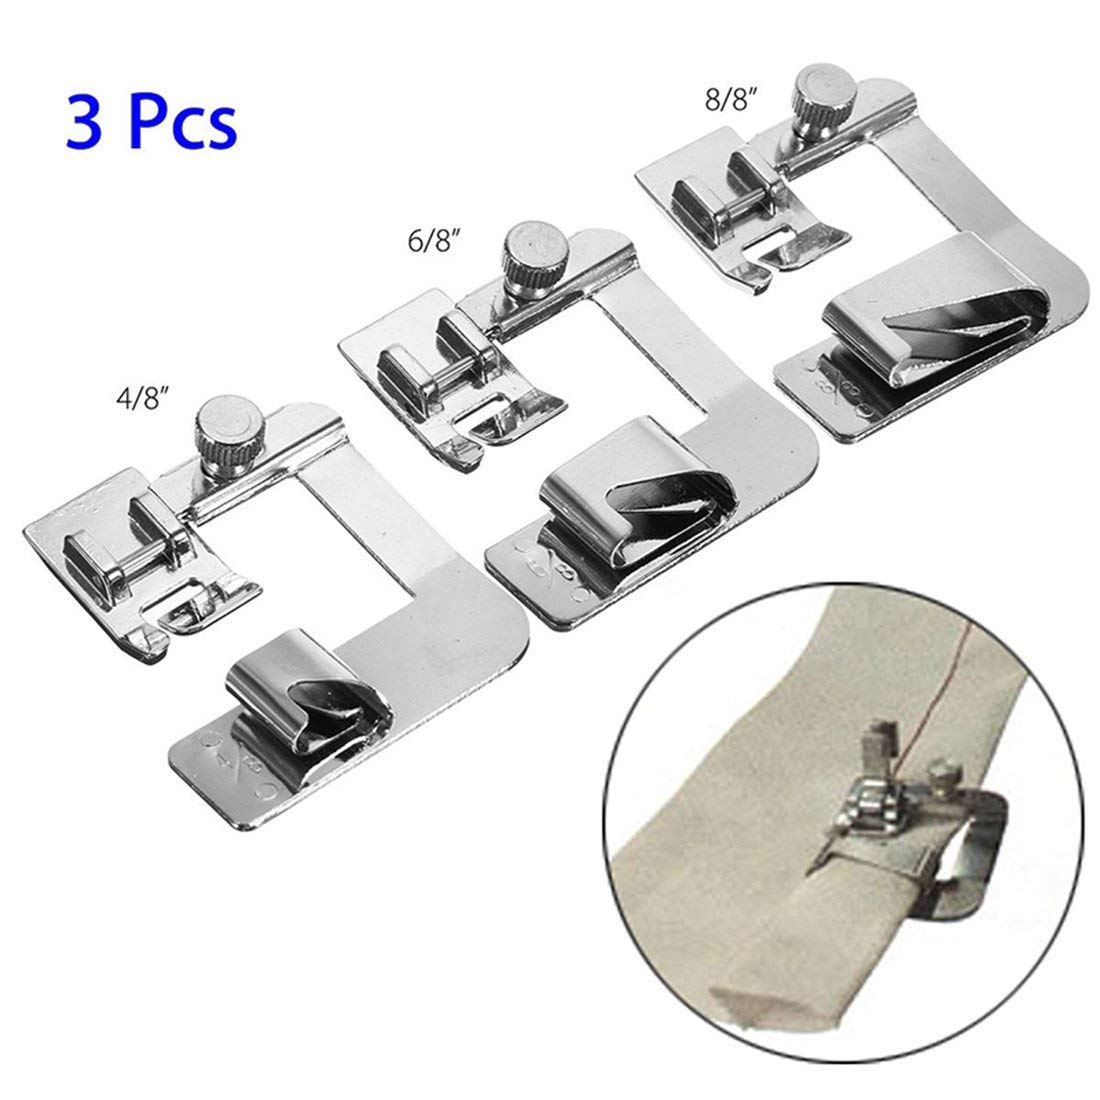 3Pcs Hemmer ancho Hemmer ajustable en forma de pie para máquinas de coser domésticas de bajo vástago Home Snap On Presser Feet Kit: Amazon.es: Hogar